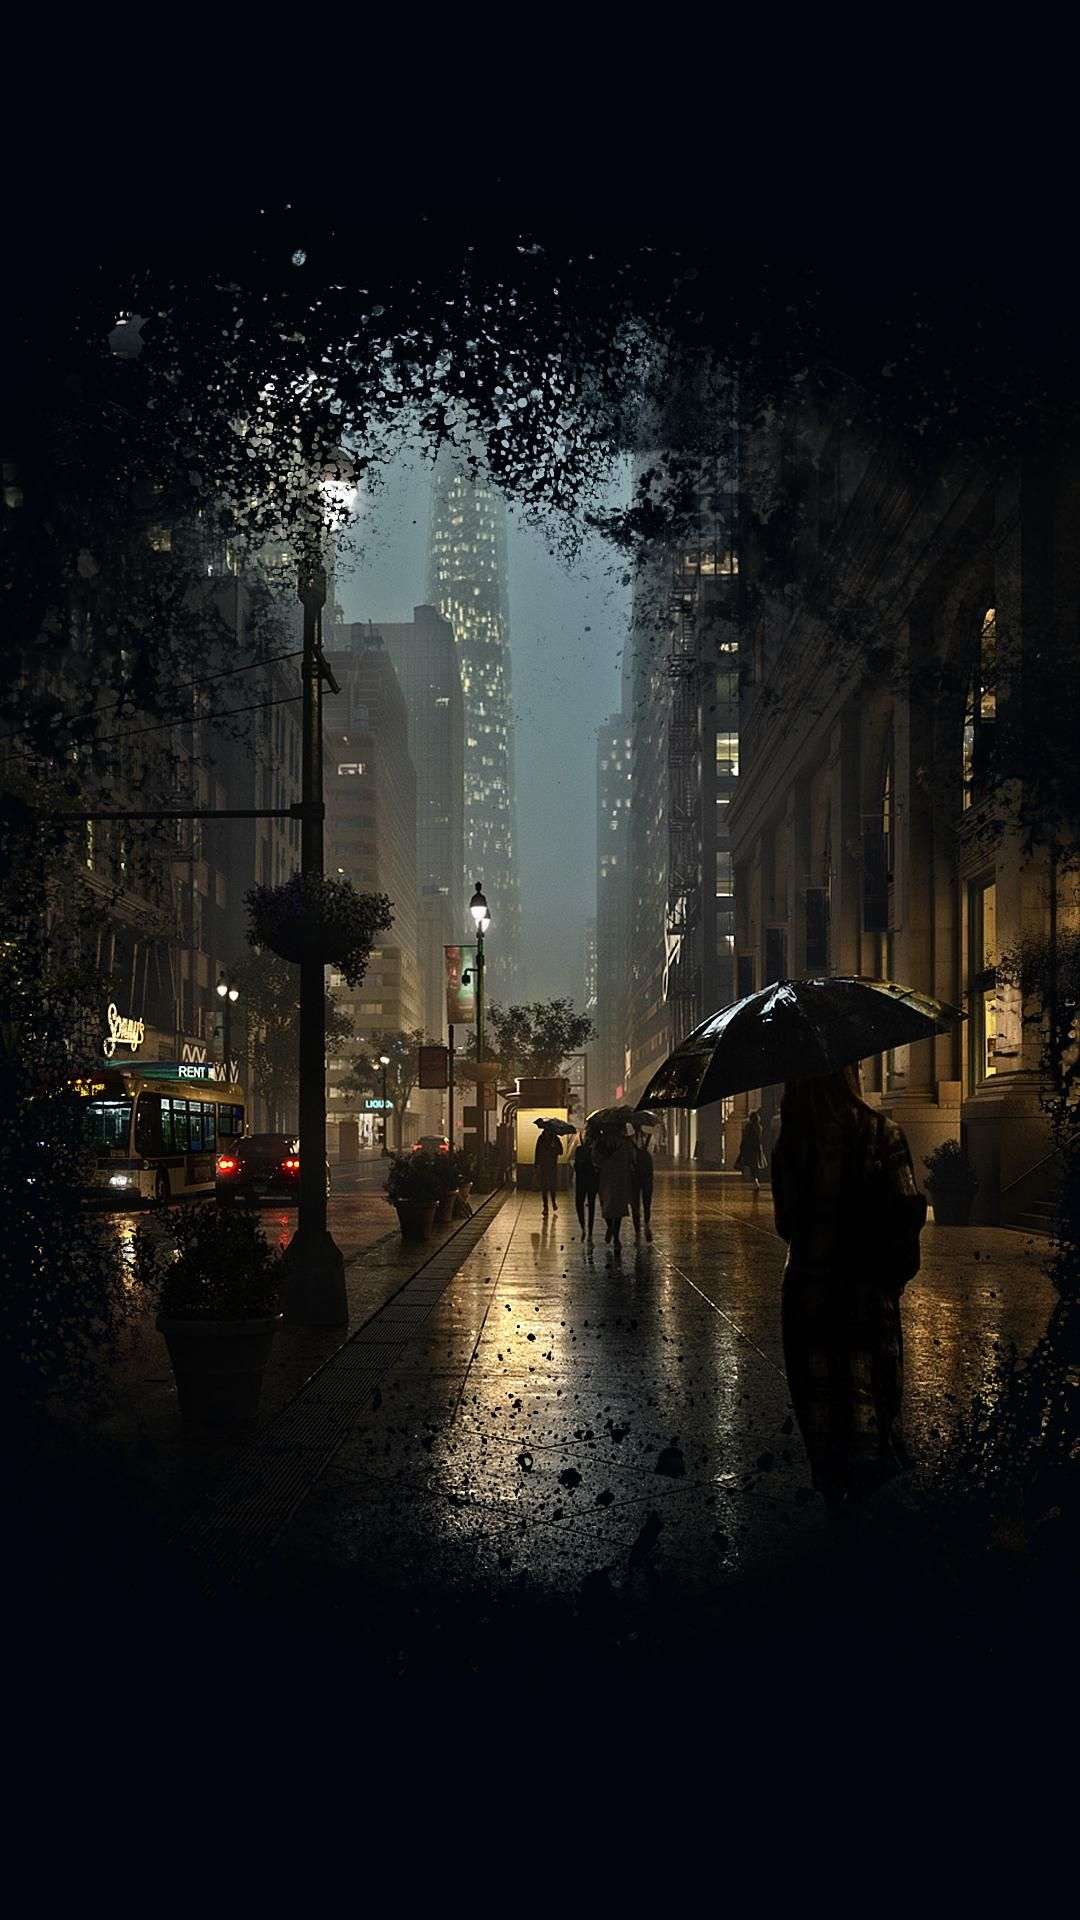 Rainy Smart Phone Wallpapers 4kphonewallpapersreddit